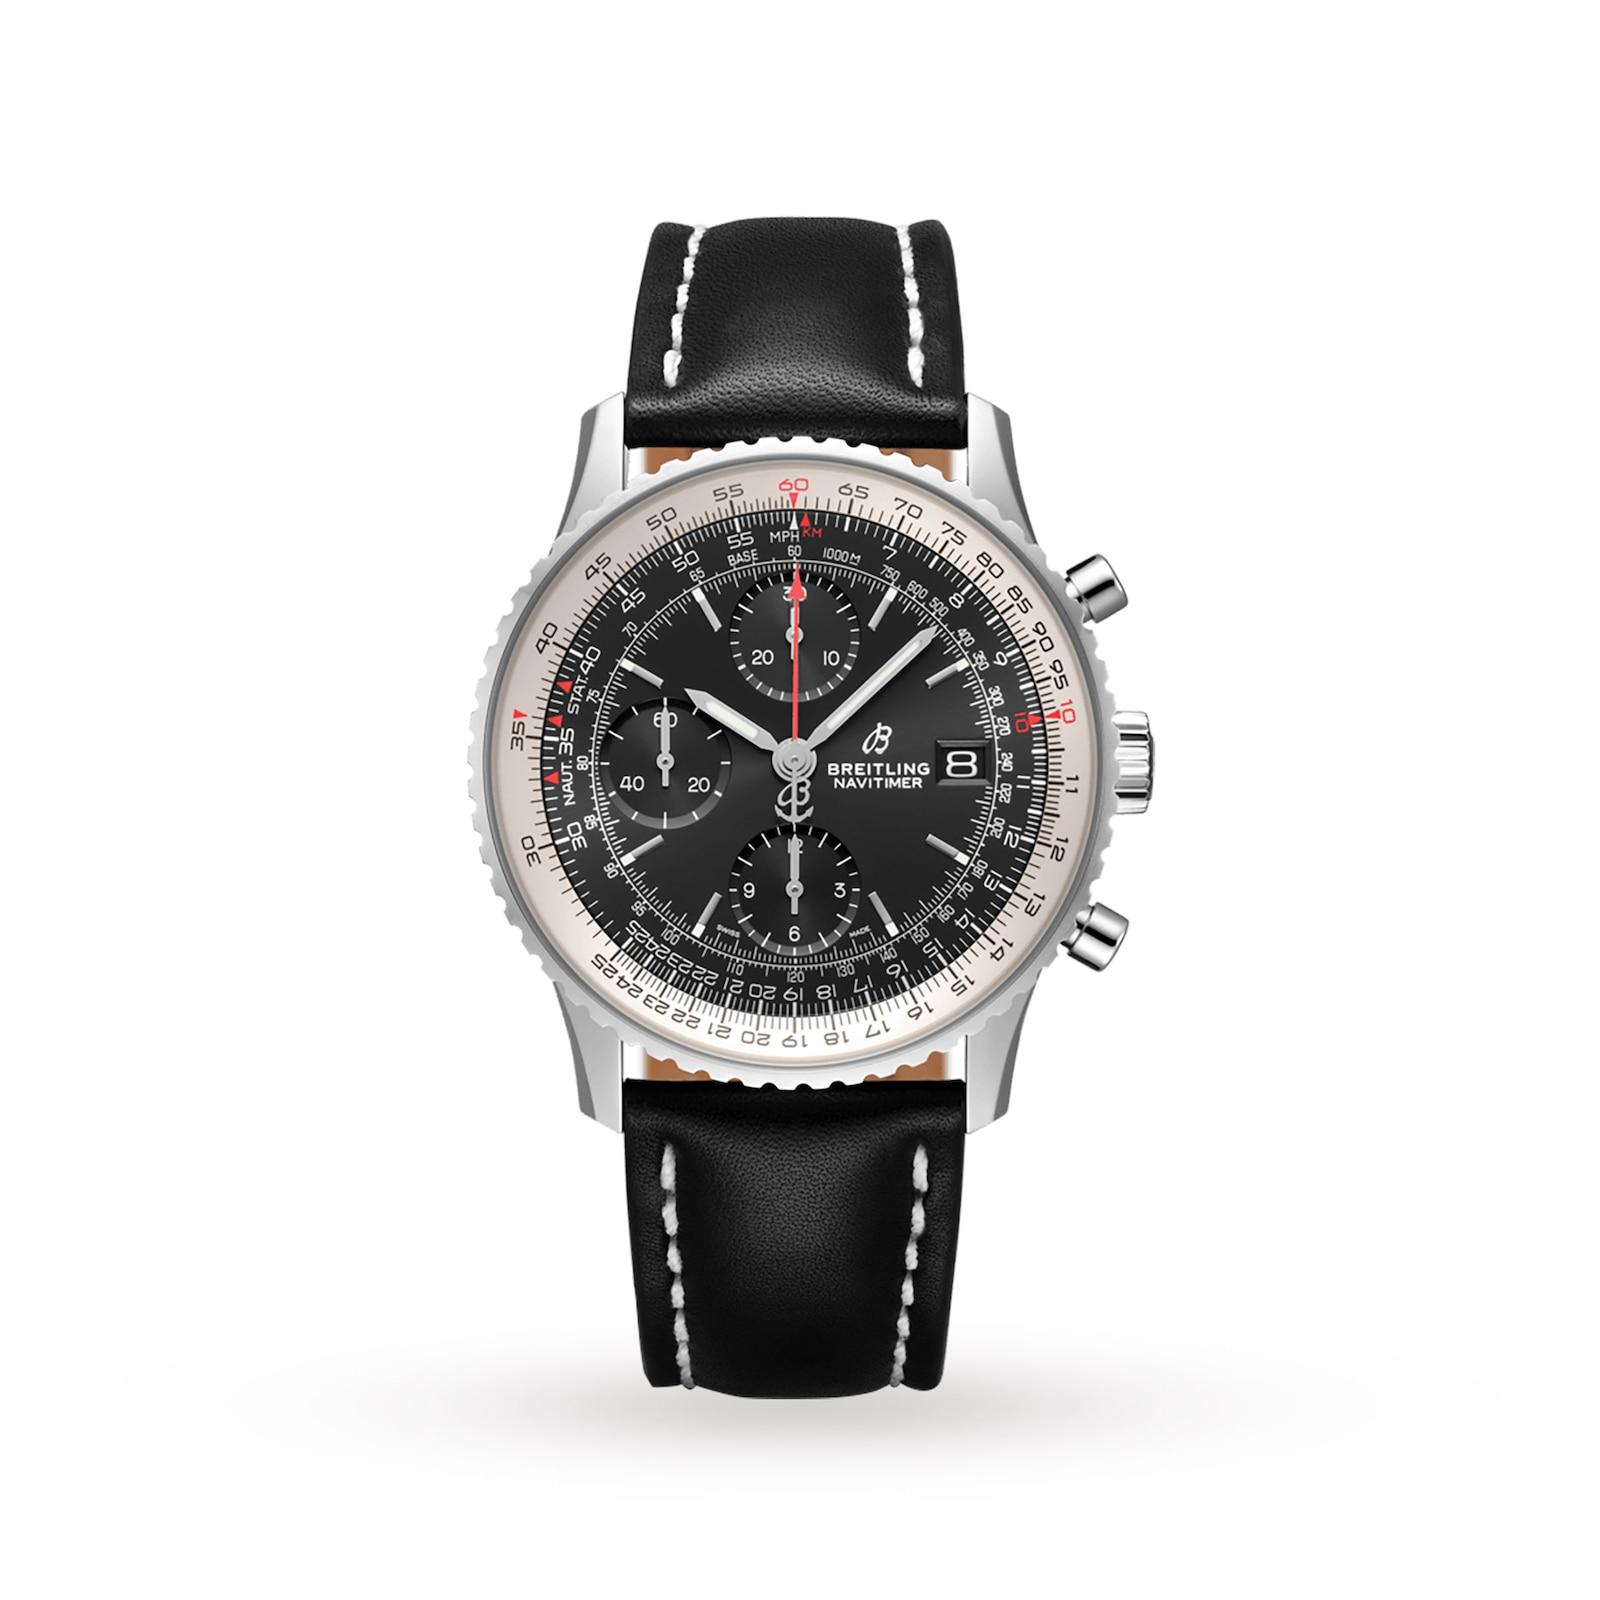 Breitling Navitimer 1 Chronograph Mens Watch